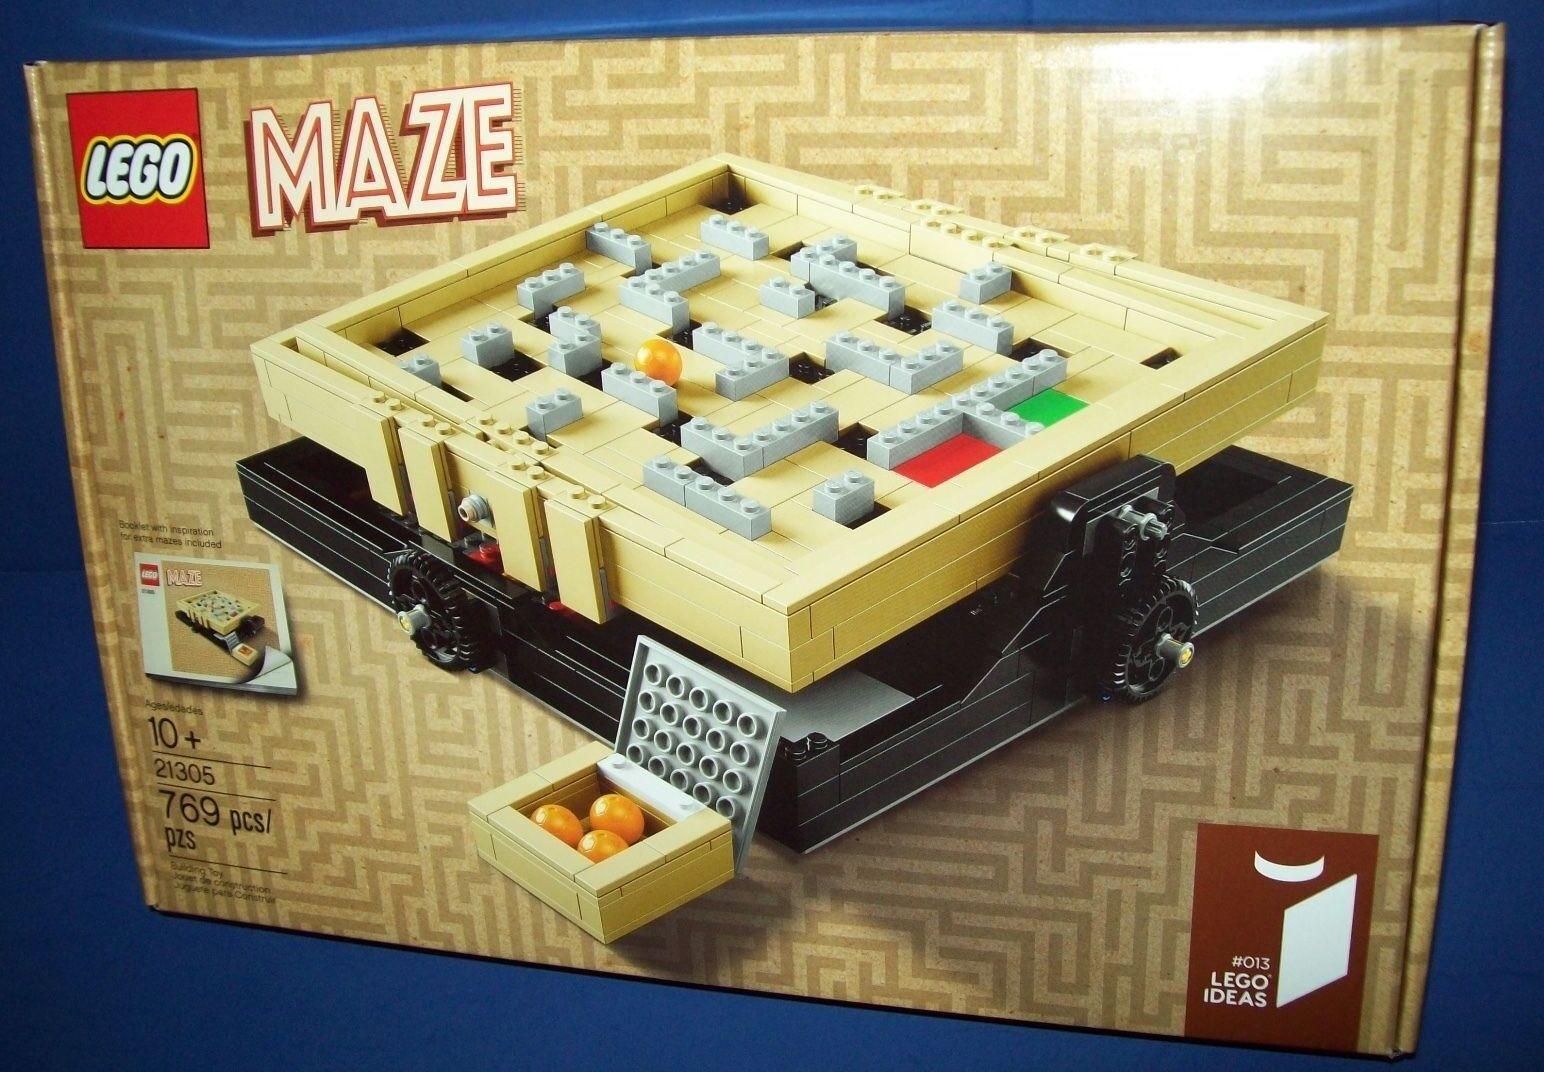 Lego 21305 Ideas Cuusoo  MAZE